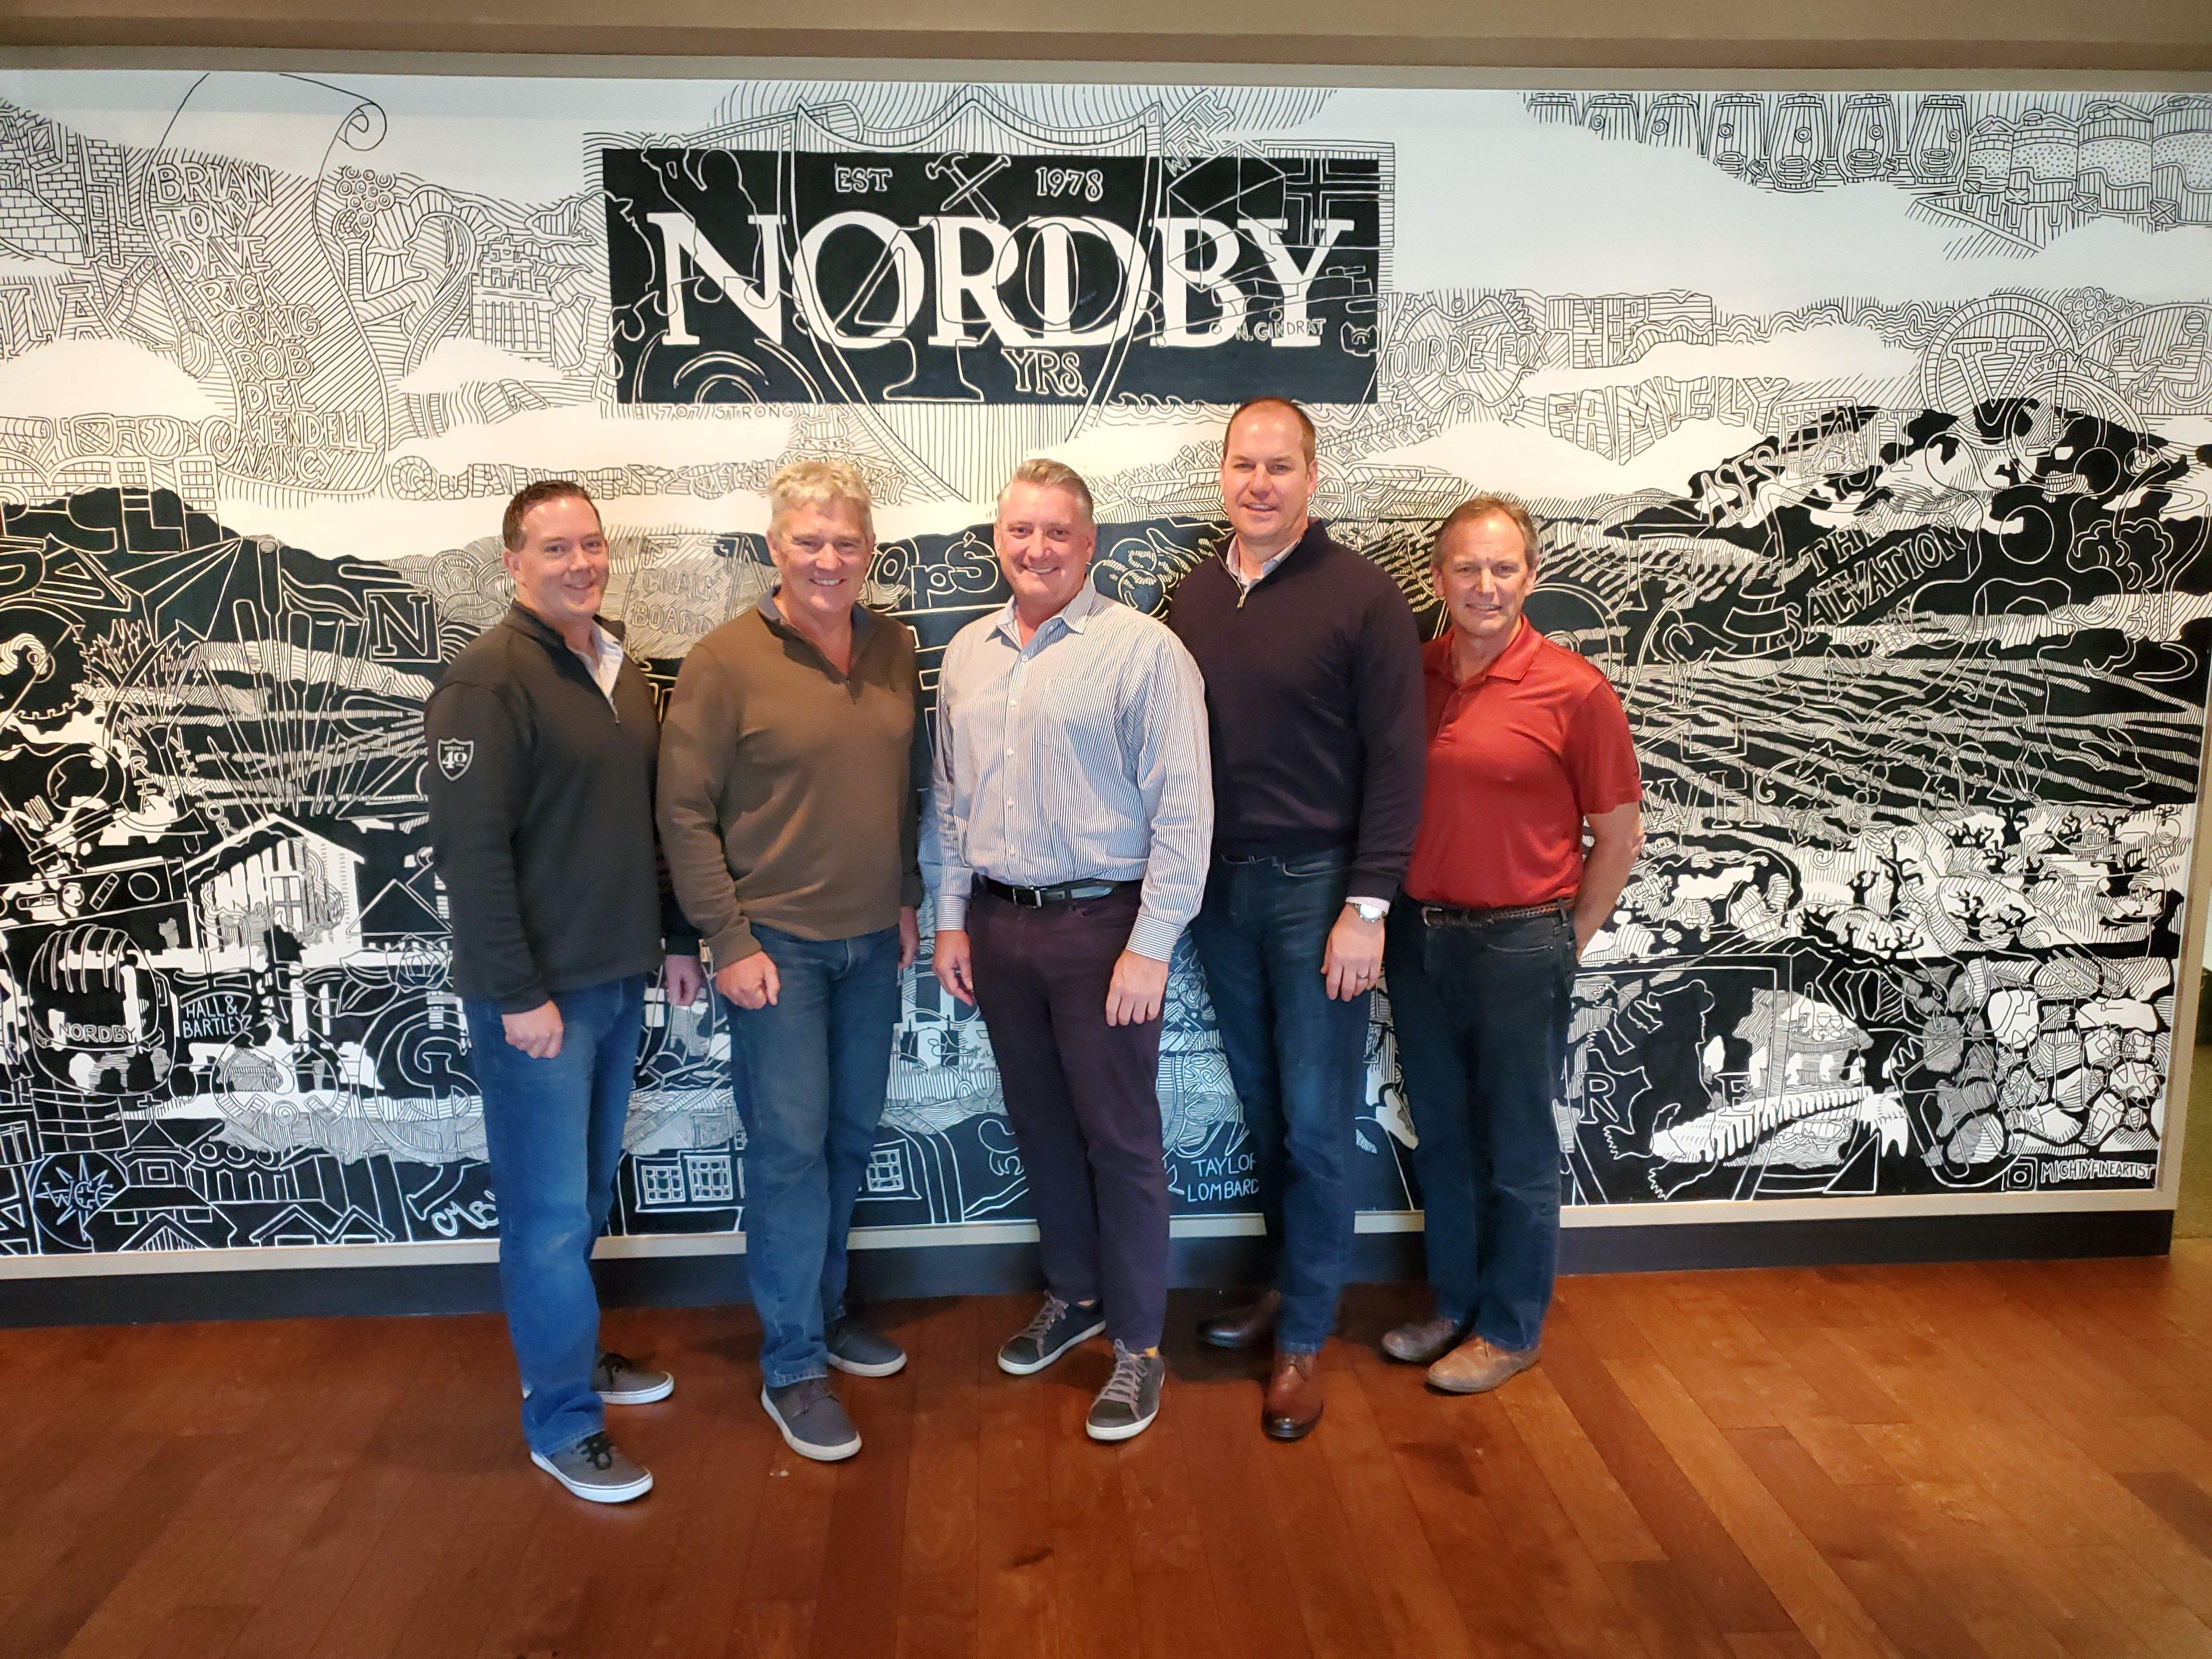 Dave Schroeder, Tony Simmons, Rick Shone, Bob Collins